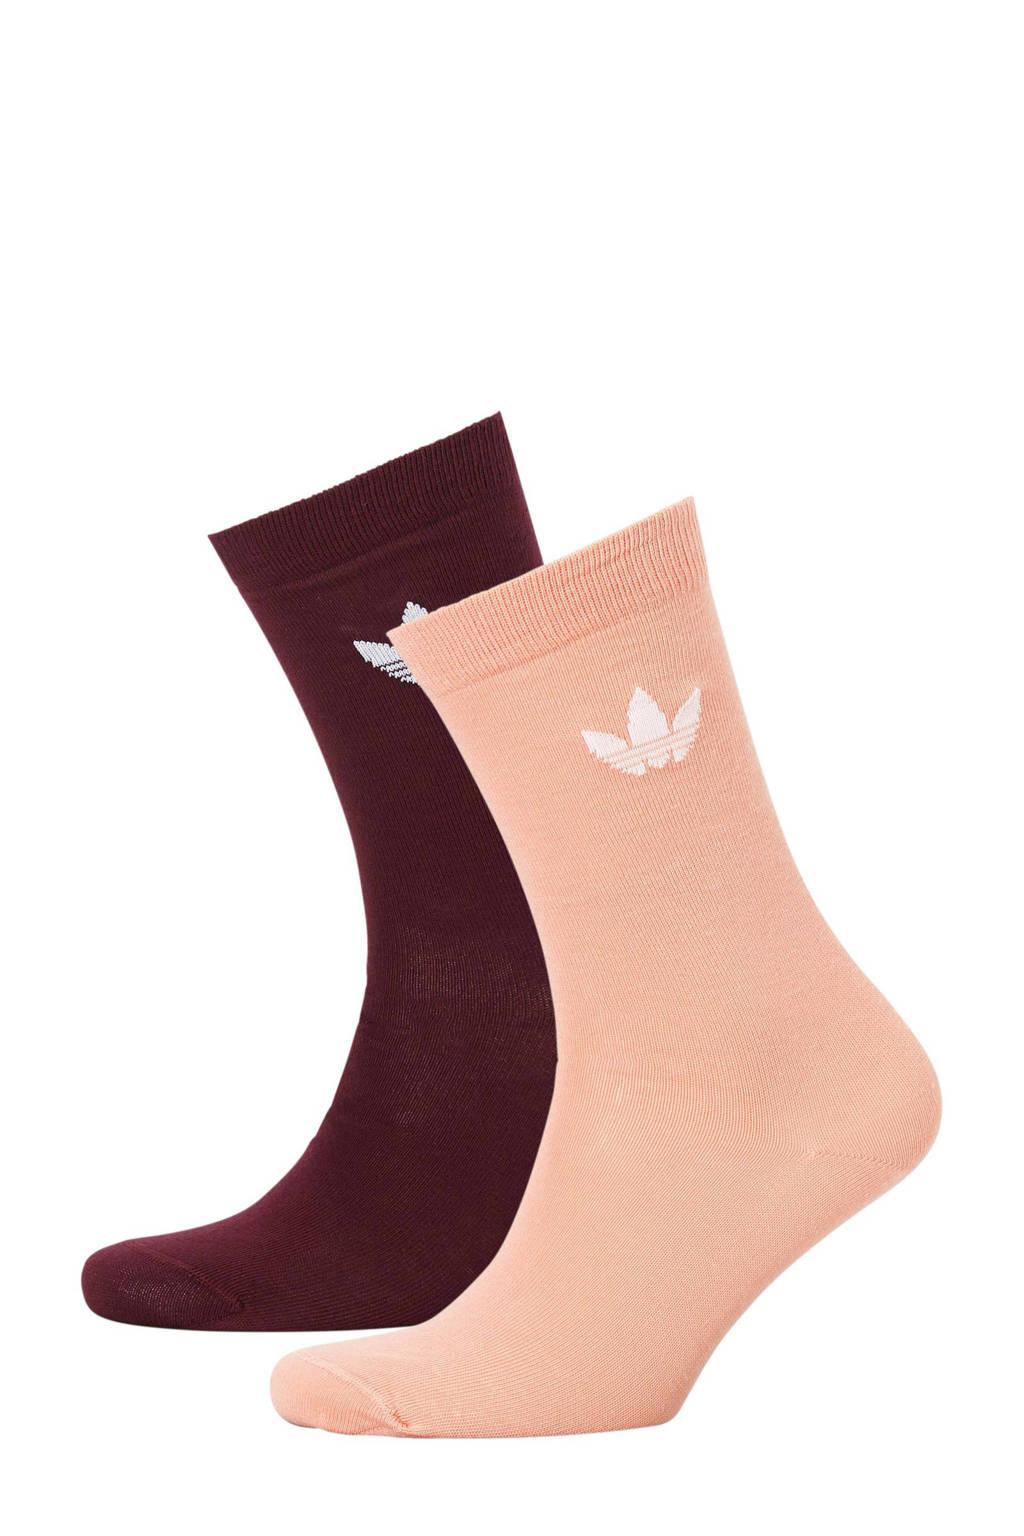 adidas originals   sokken (set van 2) donkerrood/zalm, Donkerrood/zalm